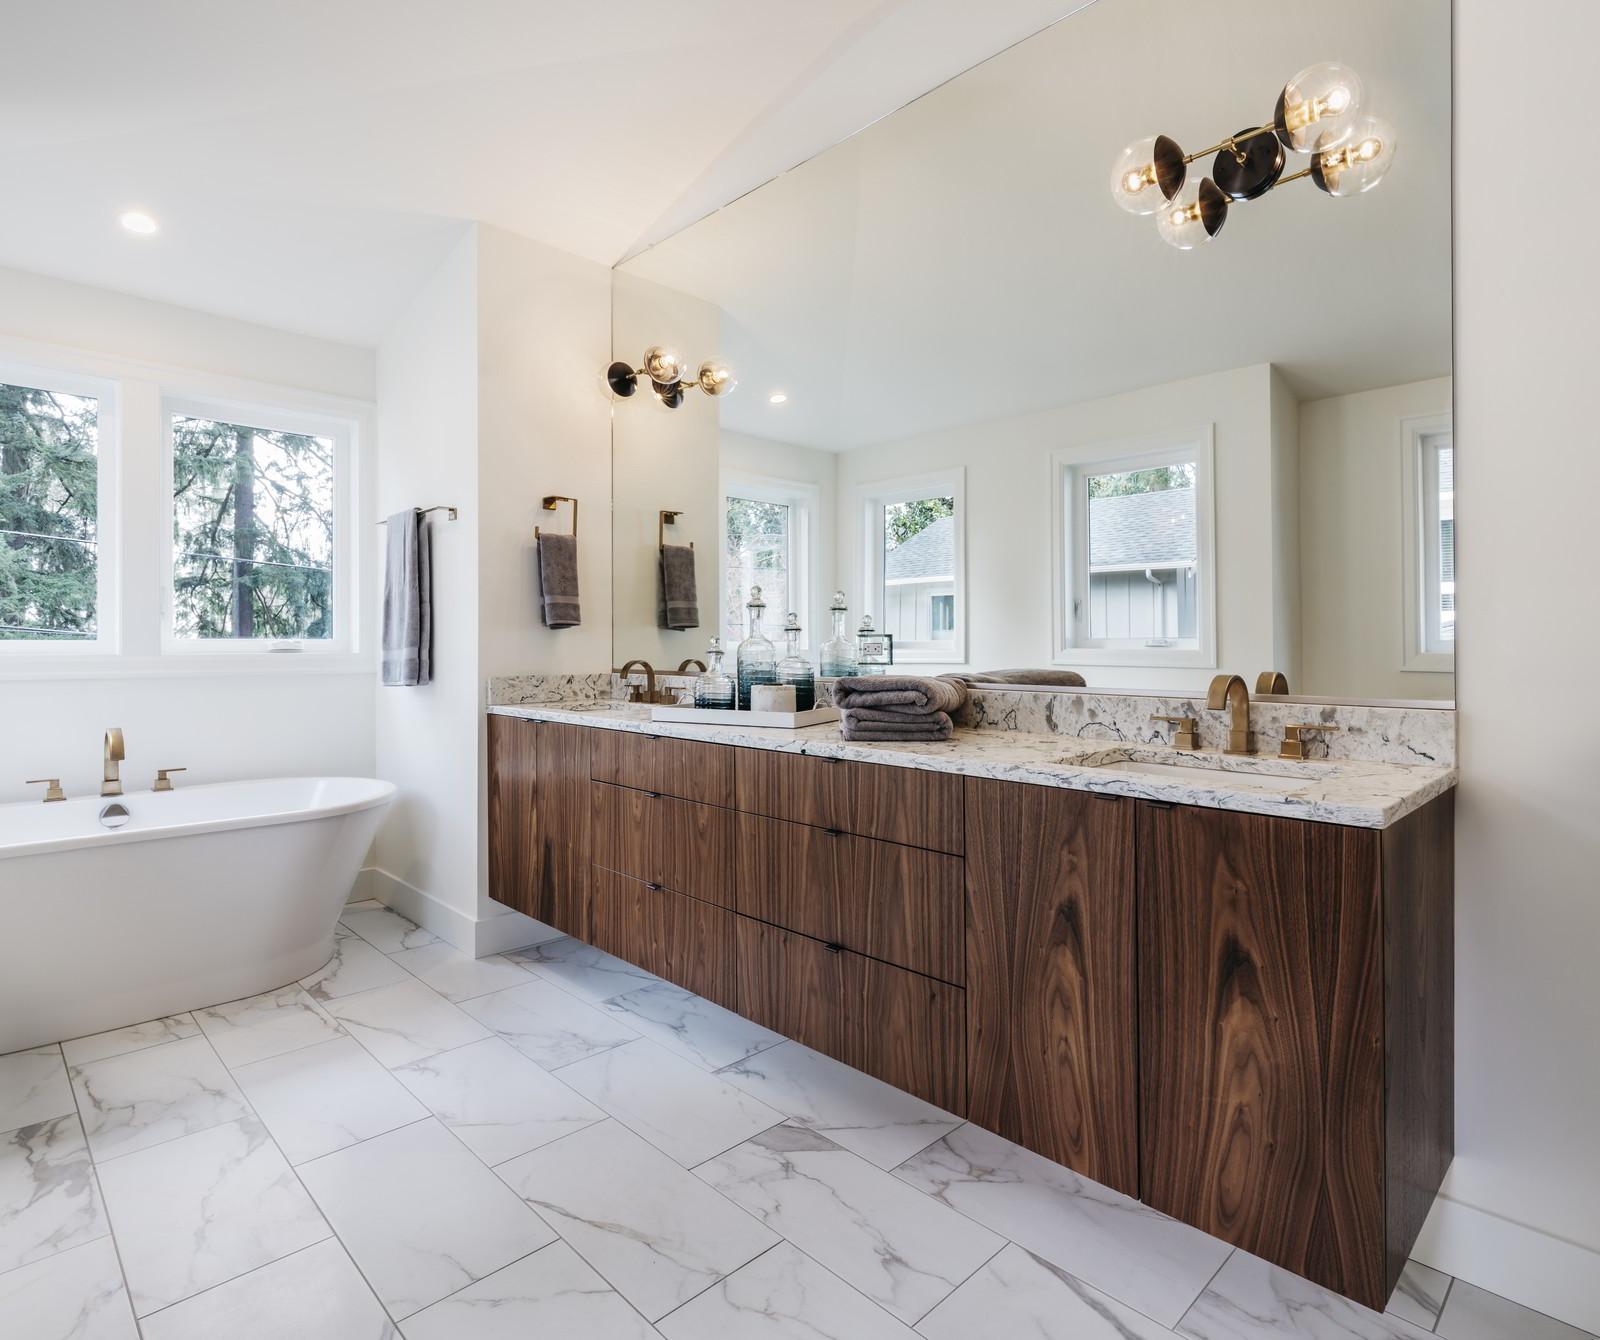 Bathroom Remodel Burbank: ITS Remodeling & Construction